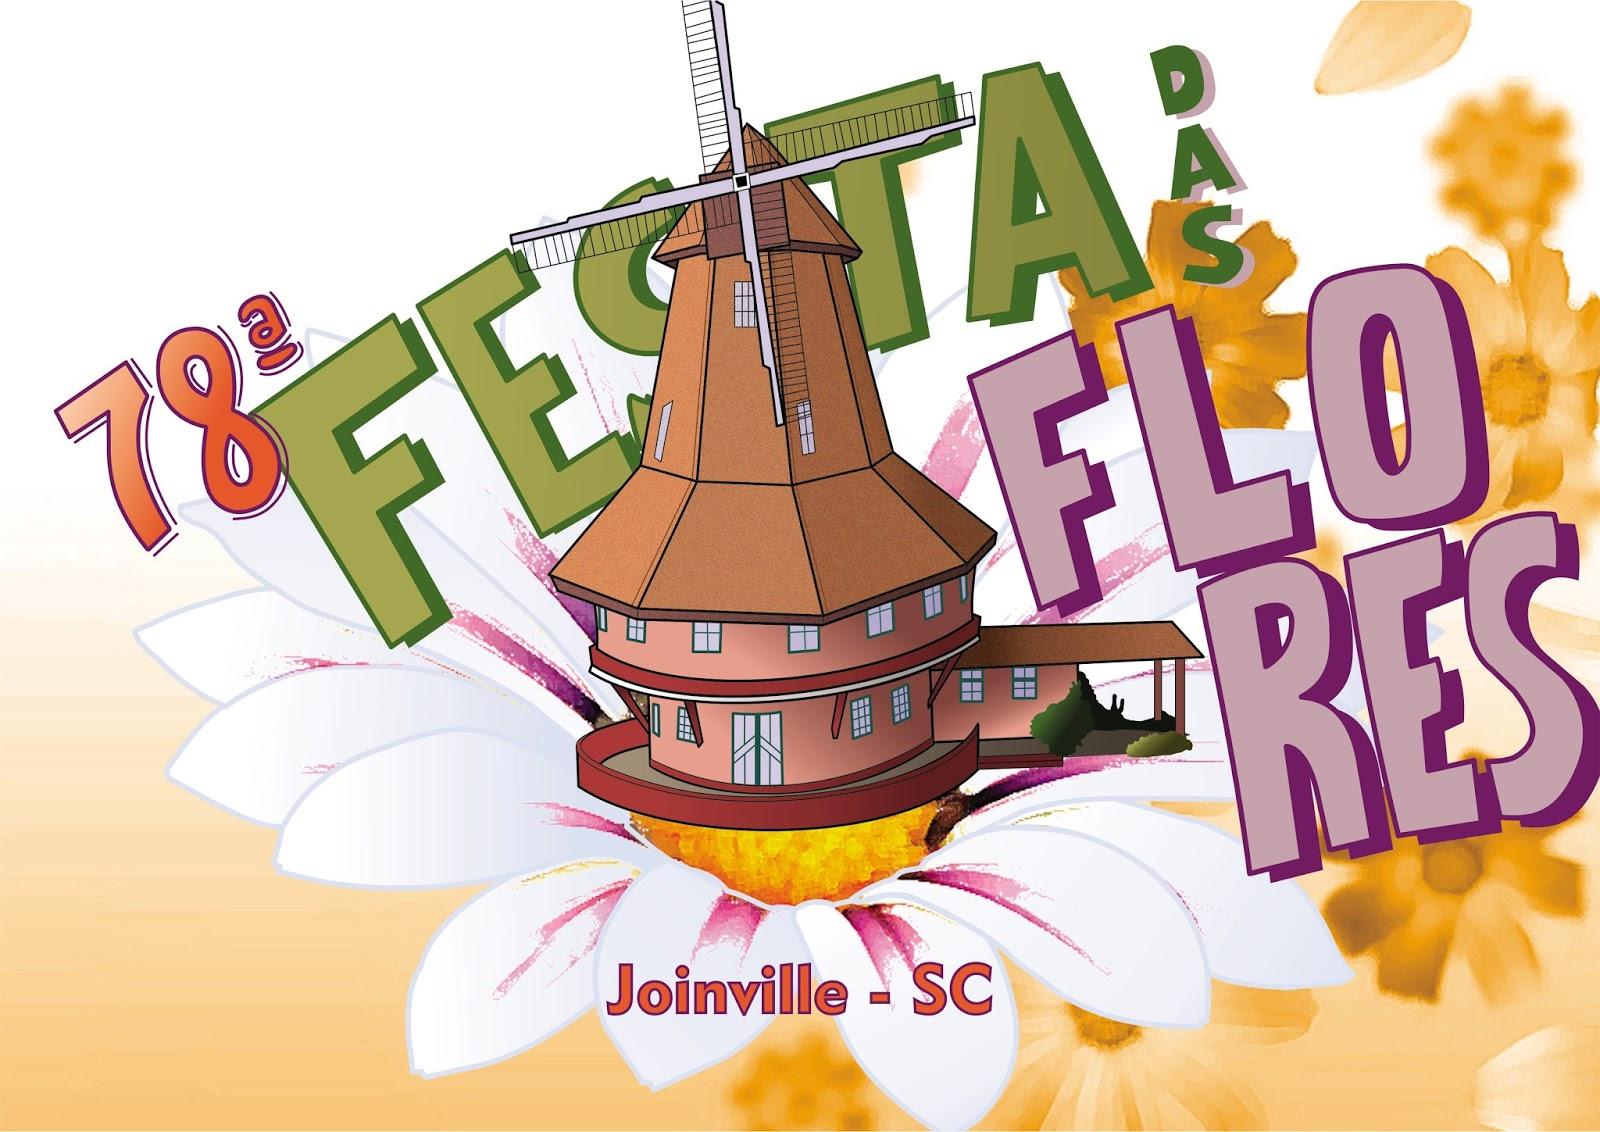 78a. Festa das Flores abre nesta quinta-feira em Joinville (SC)